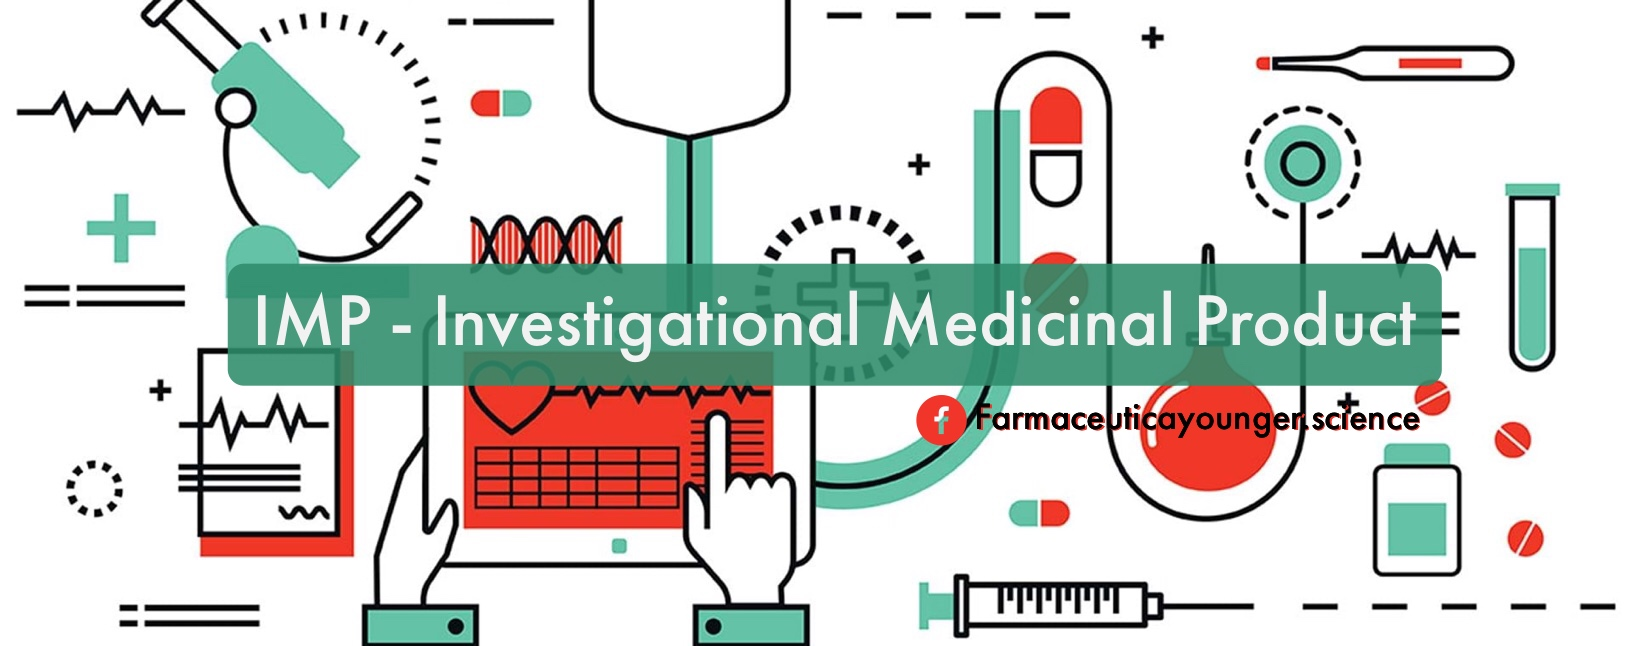 IMP - Investigational Medicinal Product